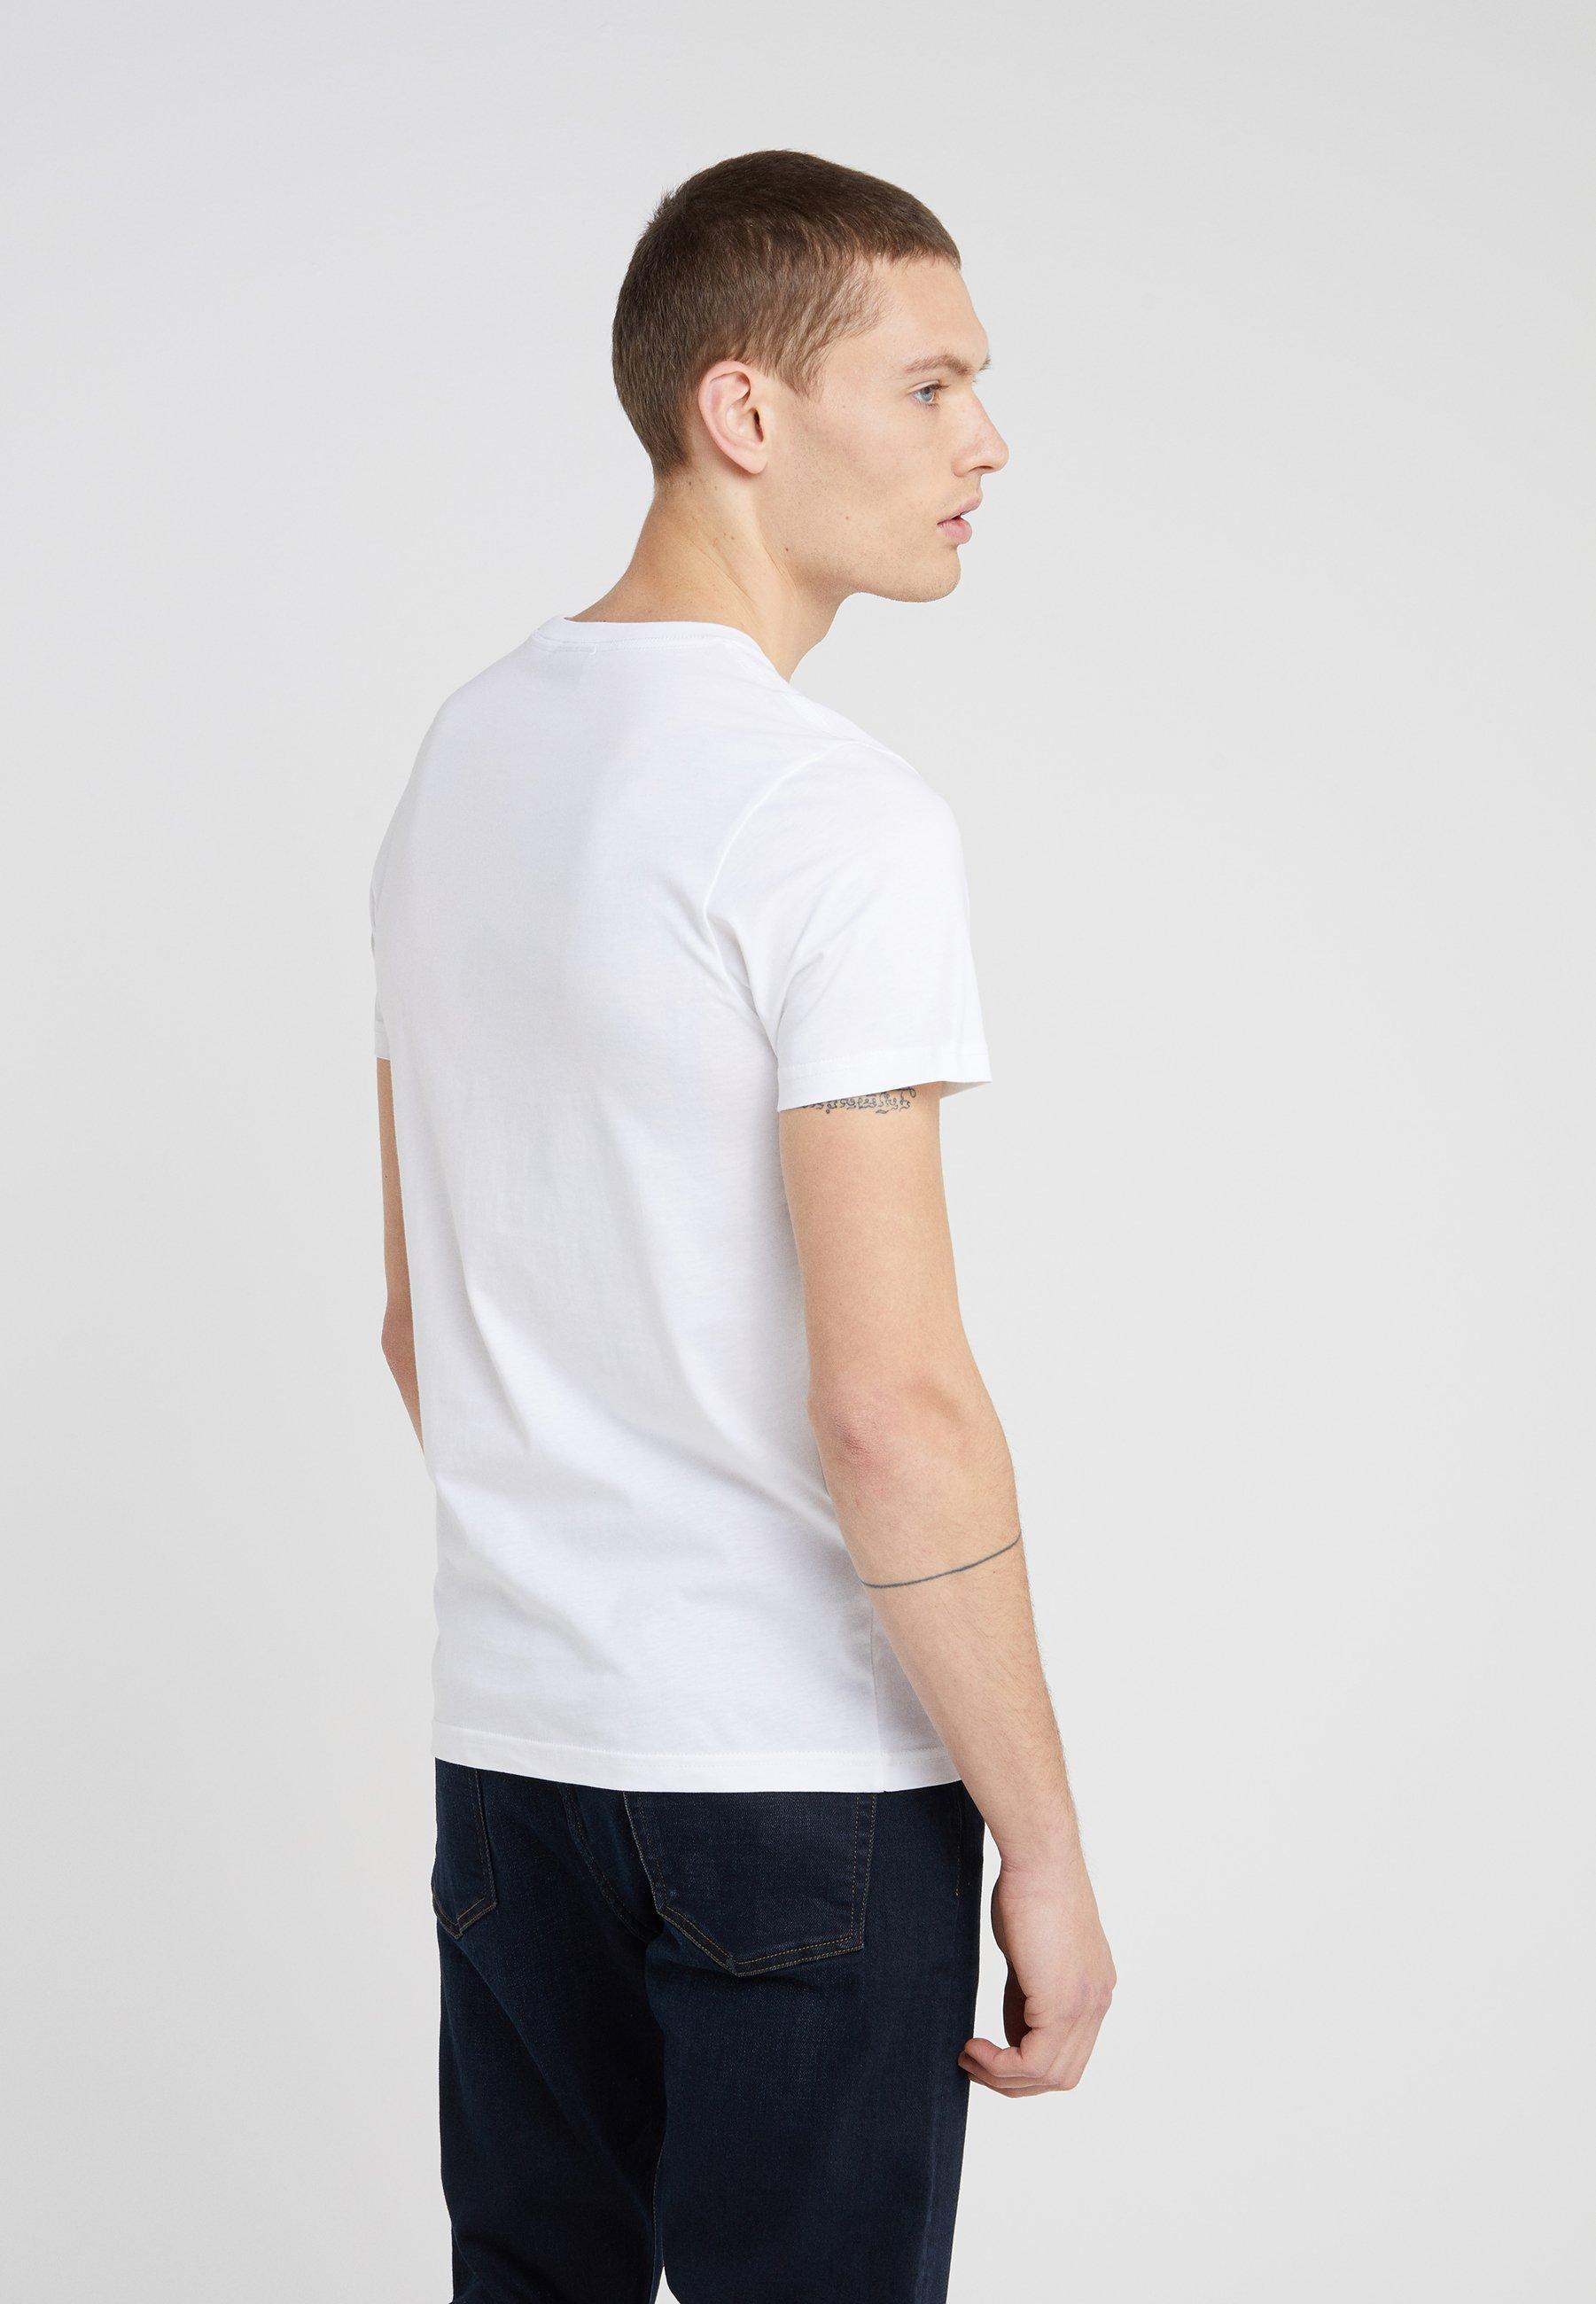 ImpriméWhite Ps T Paul Smith shirt NnPkZO8X0w